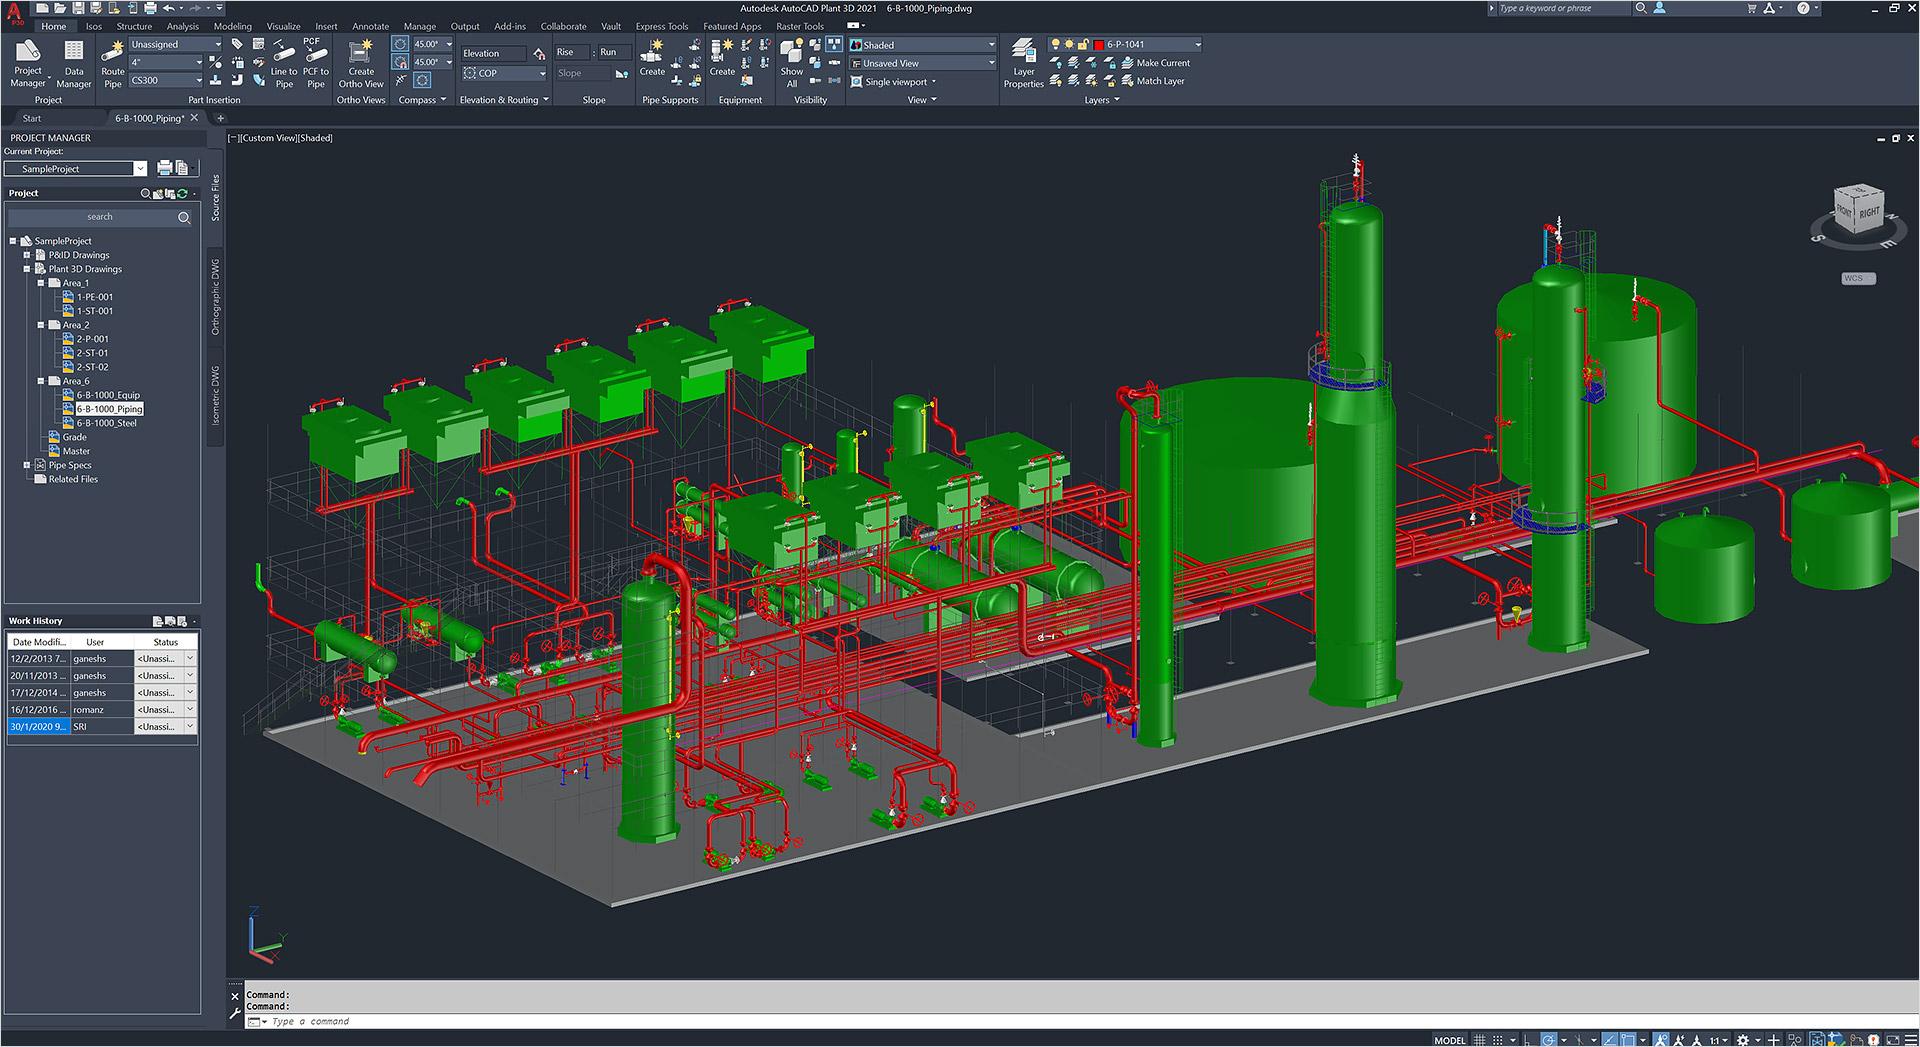 Conjunto De Ferramentas Autocad Plant 3d Software De Projecao E Layout De Instalacoes Industriais 3d Autodesk